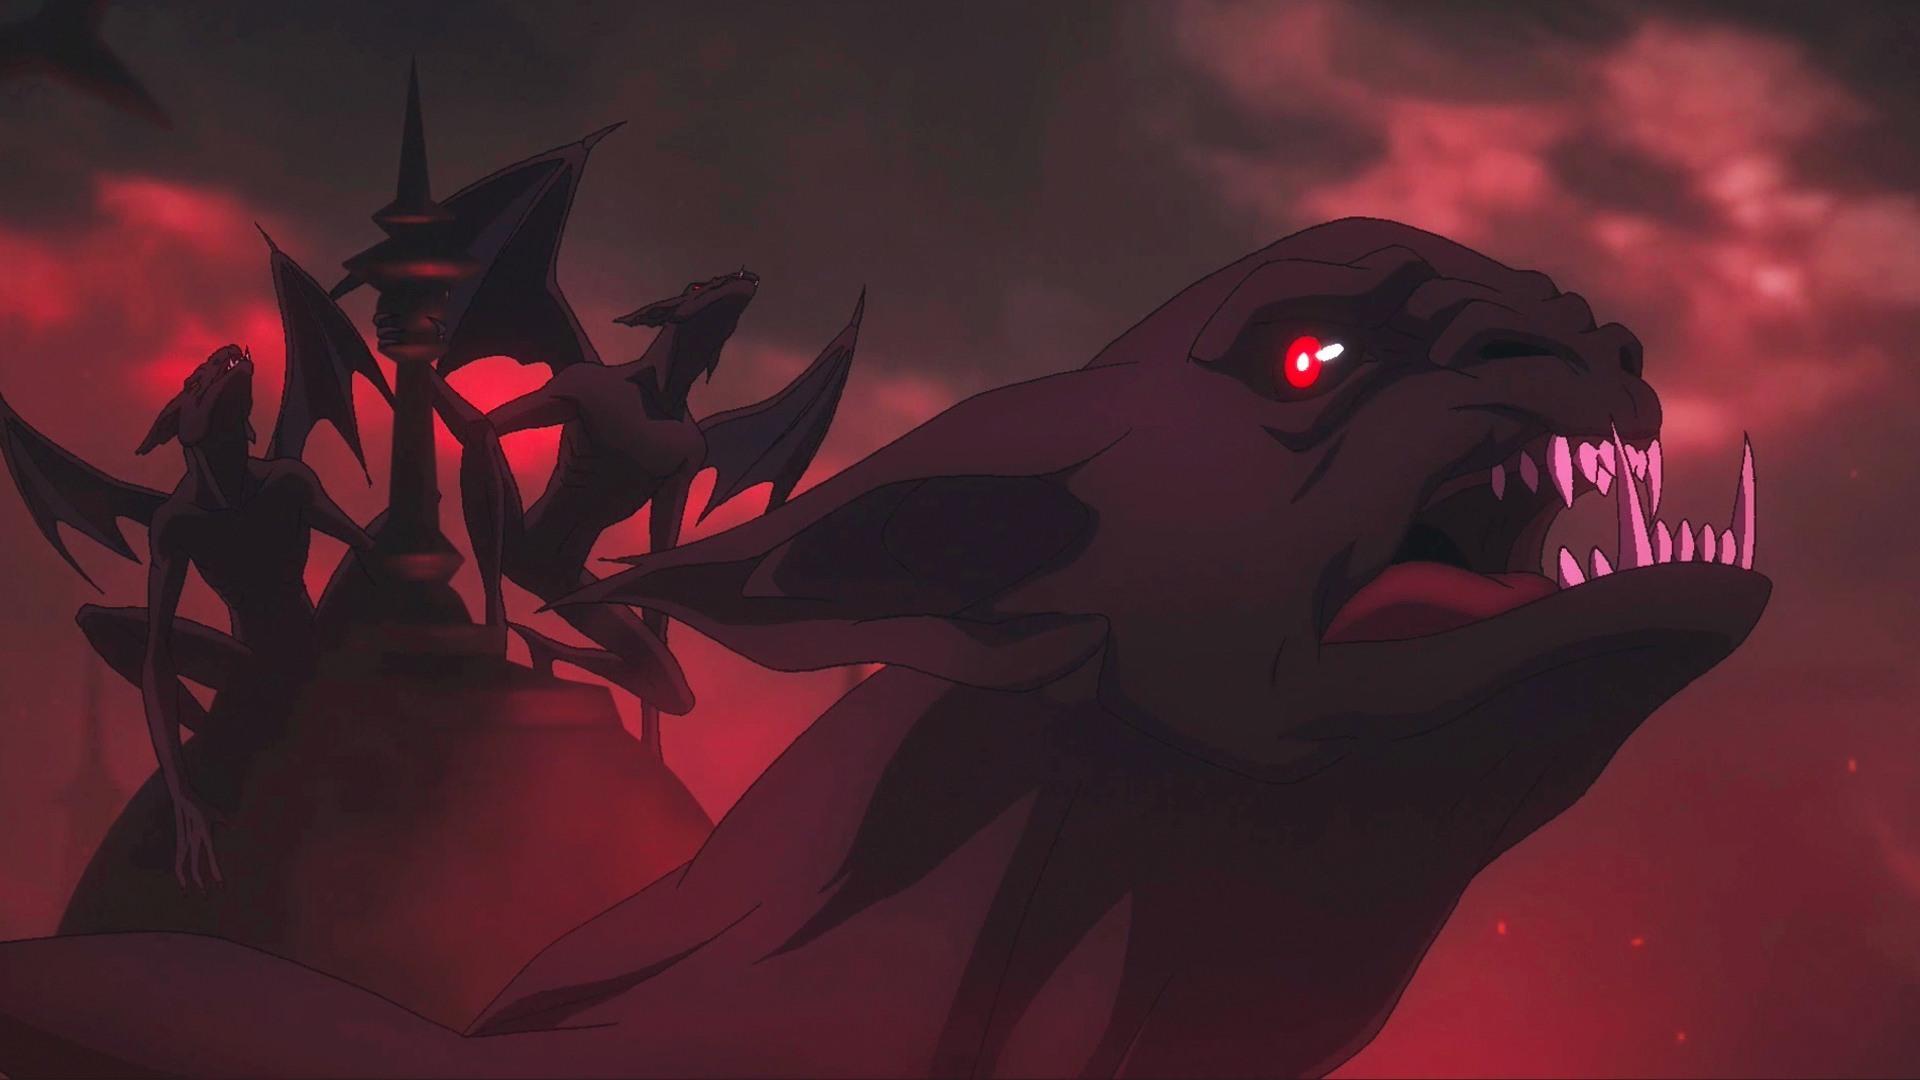 castlevania-season-2-of-netflix-series-to-premiere-this-summ_j8hn.jpg